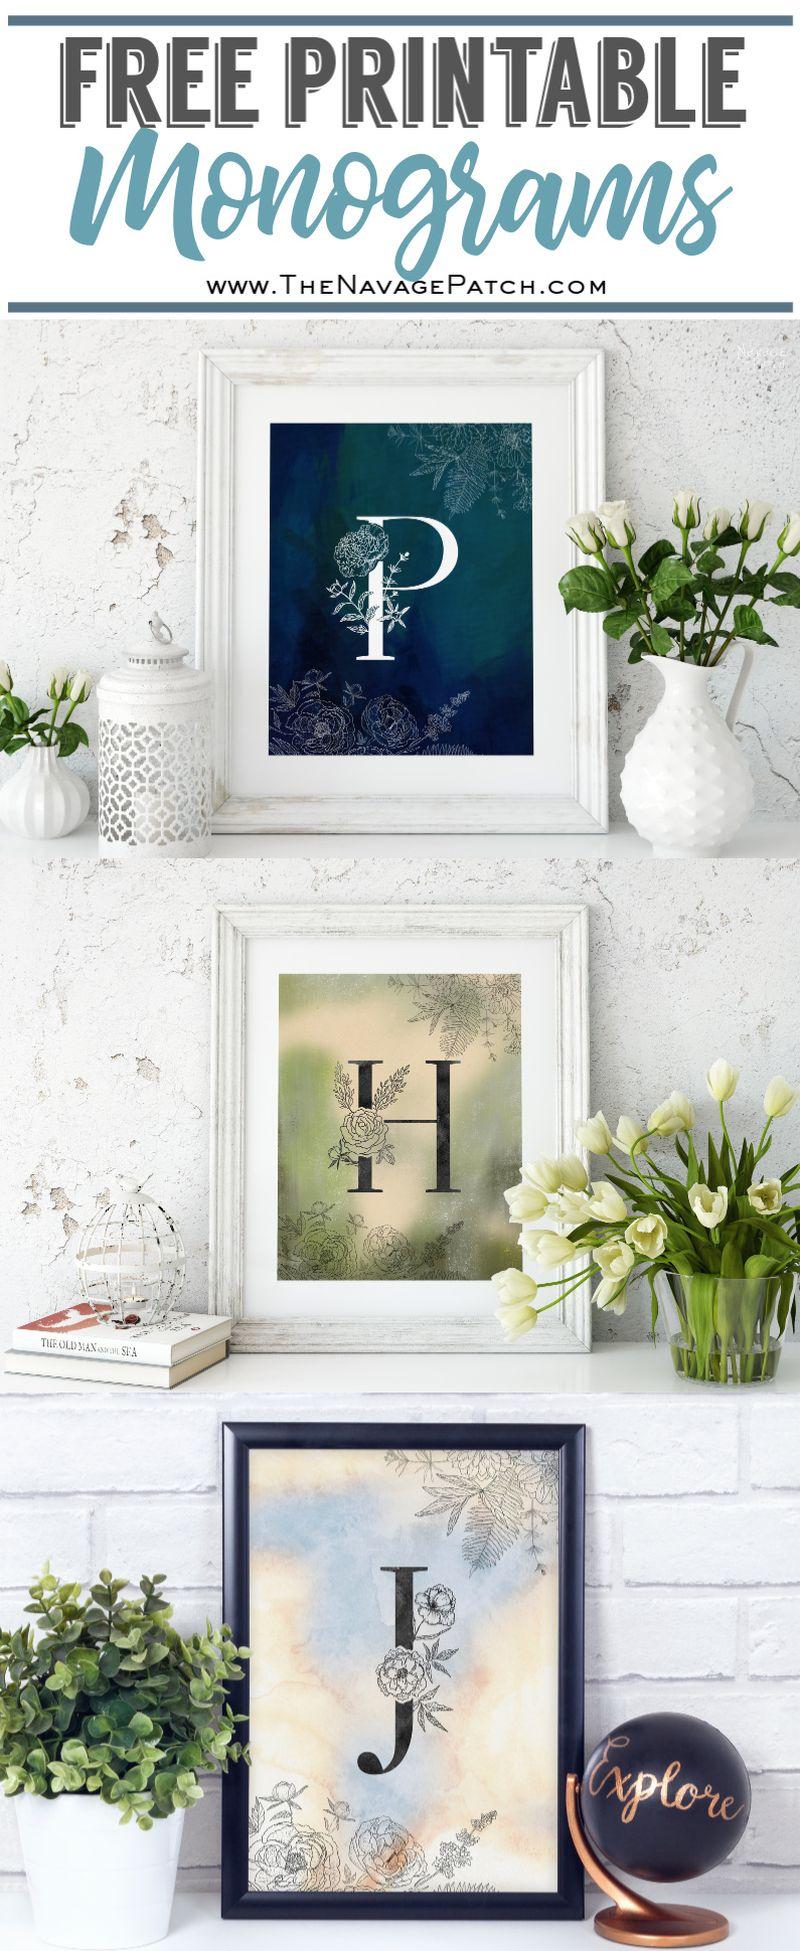 Beautiful Free Printable Floral Monograms   TheNavagePatch.com